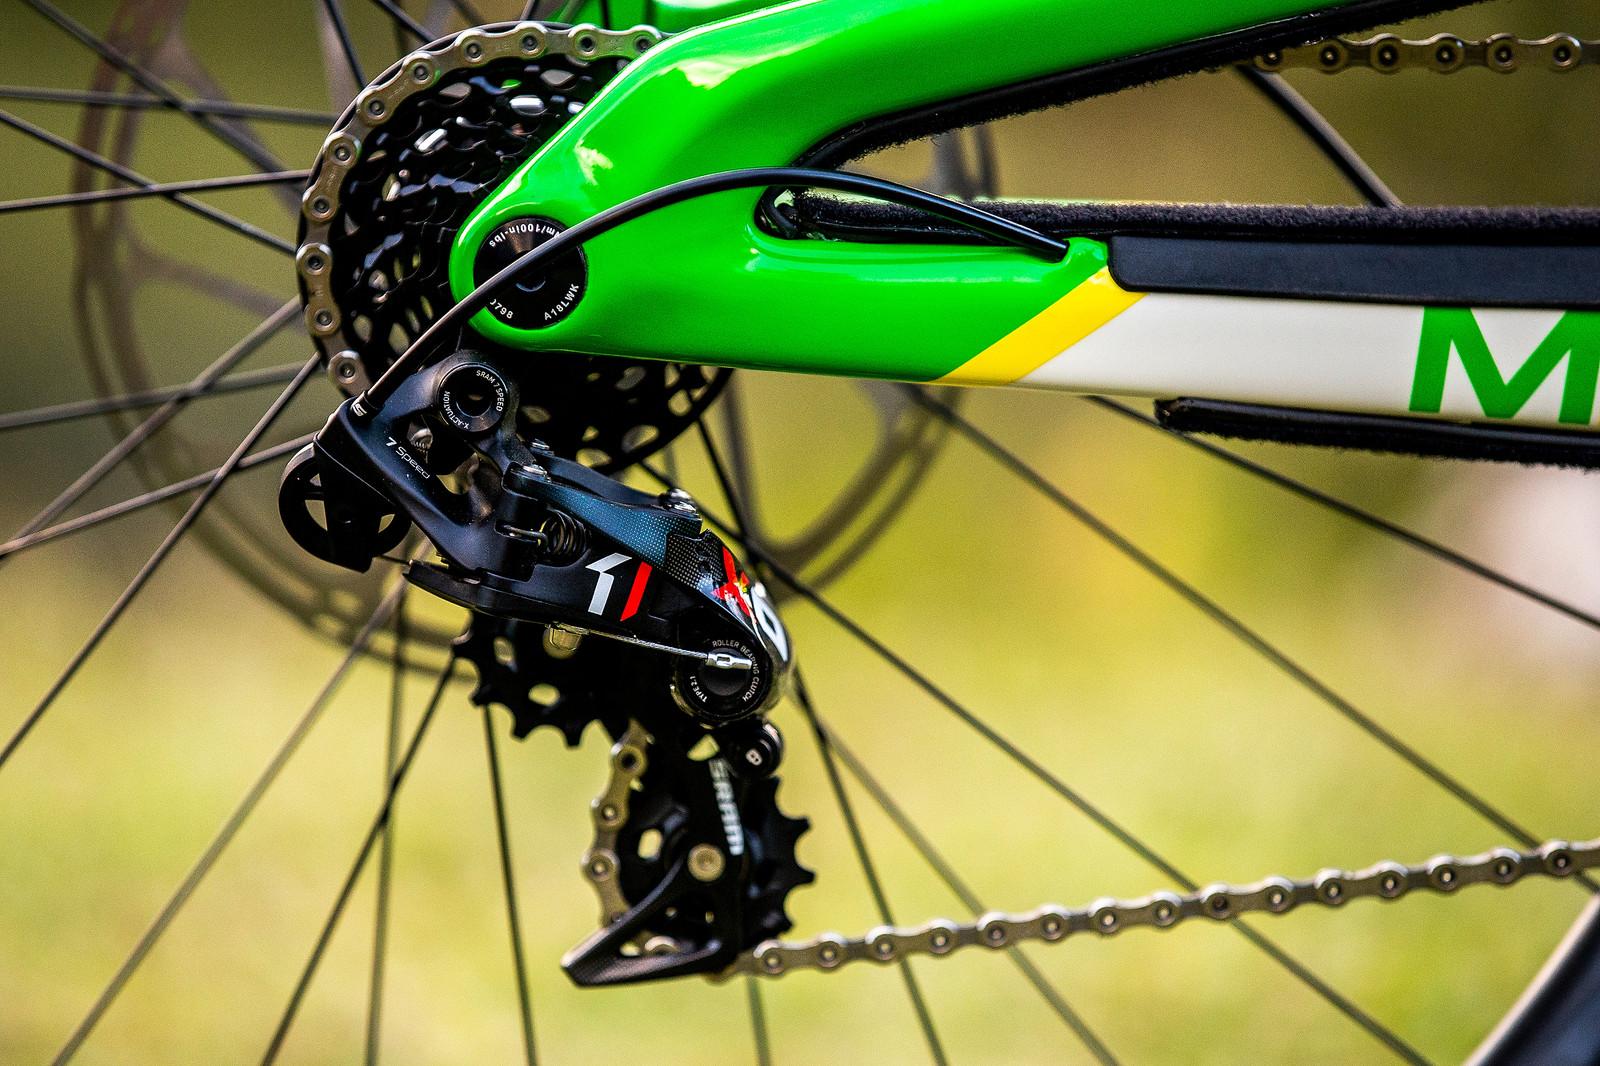 SRAM Shifting - WORLD CHAMPS BIKE - Dean Lucas' Intense M29 - Mountain Biking Pictures - Vital MTB